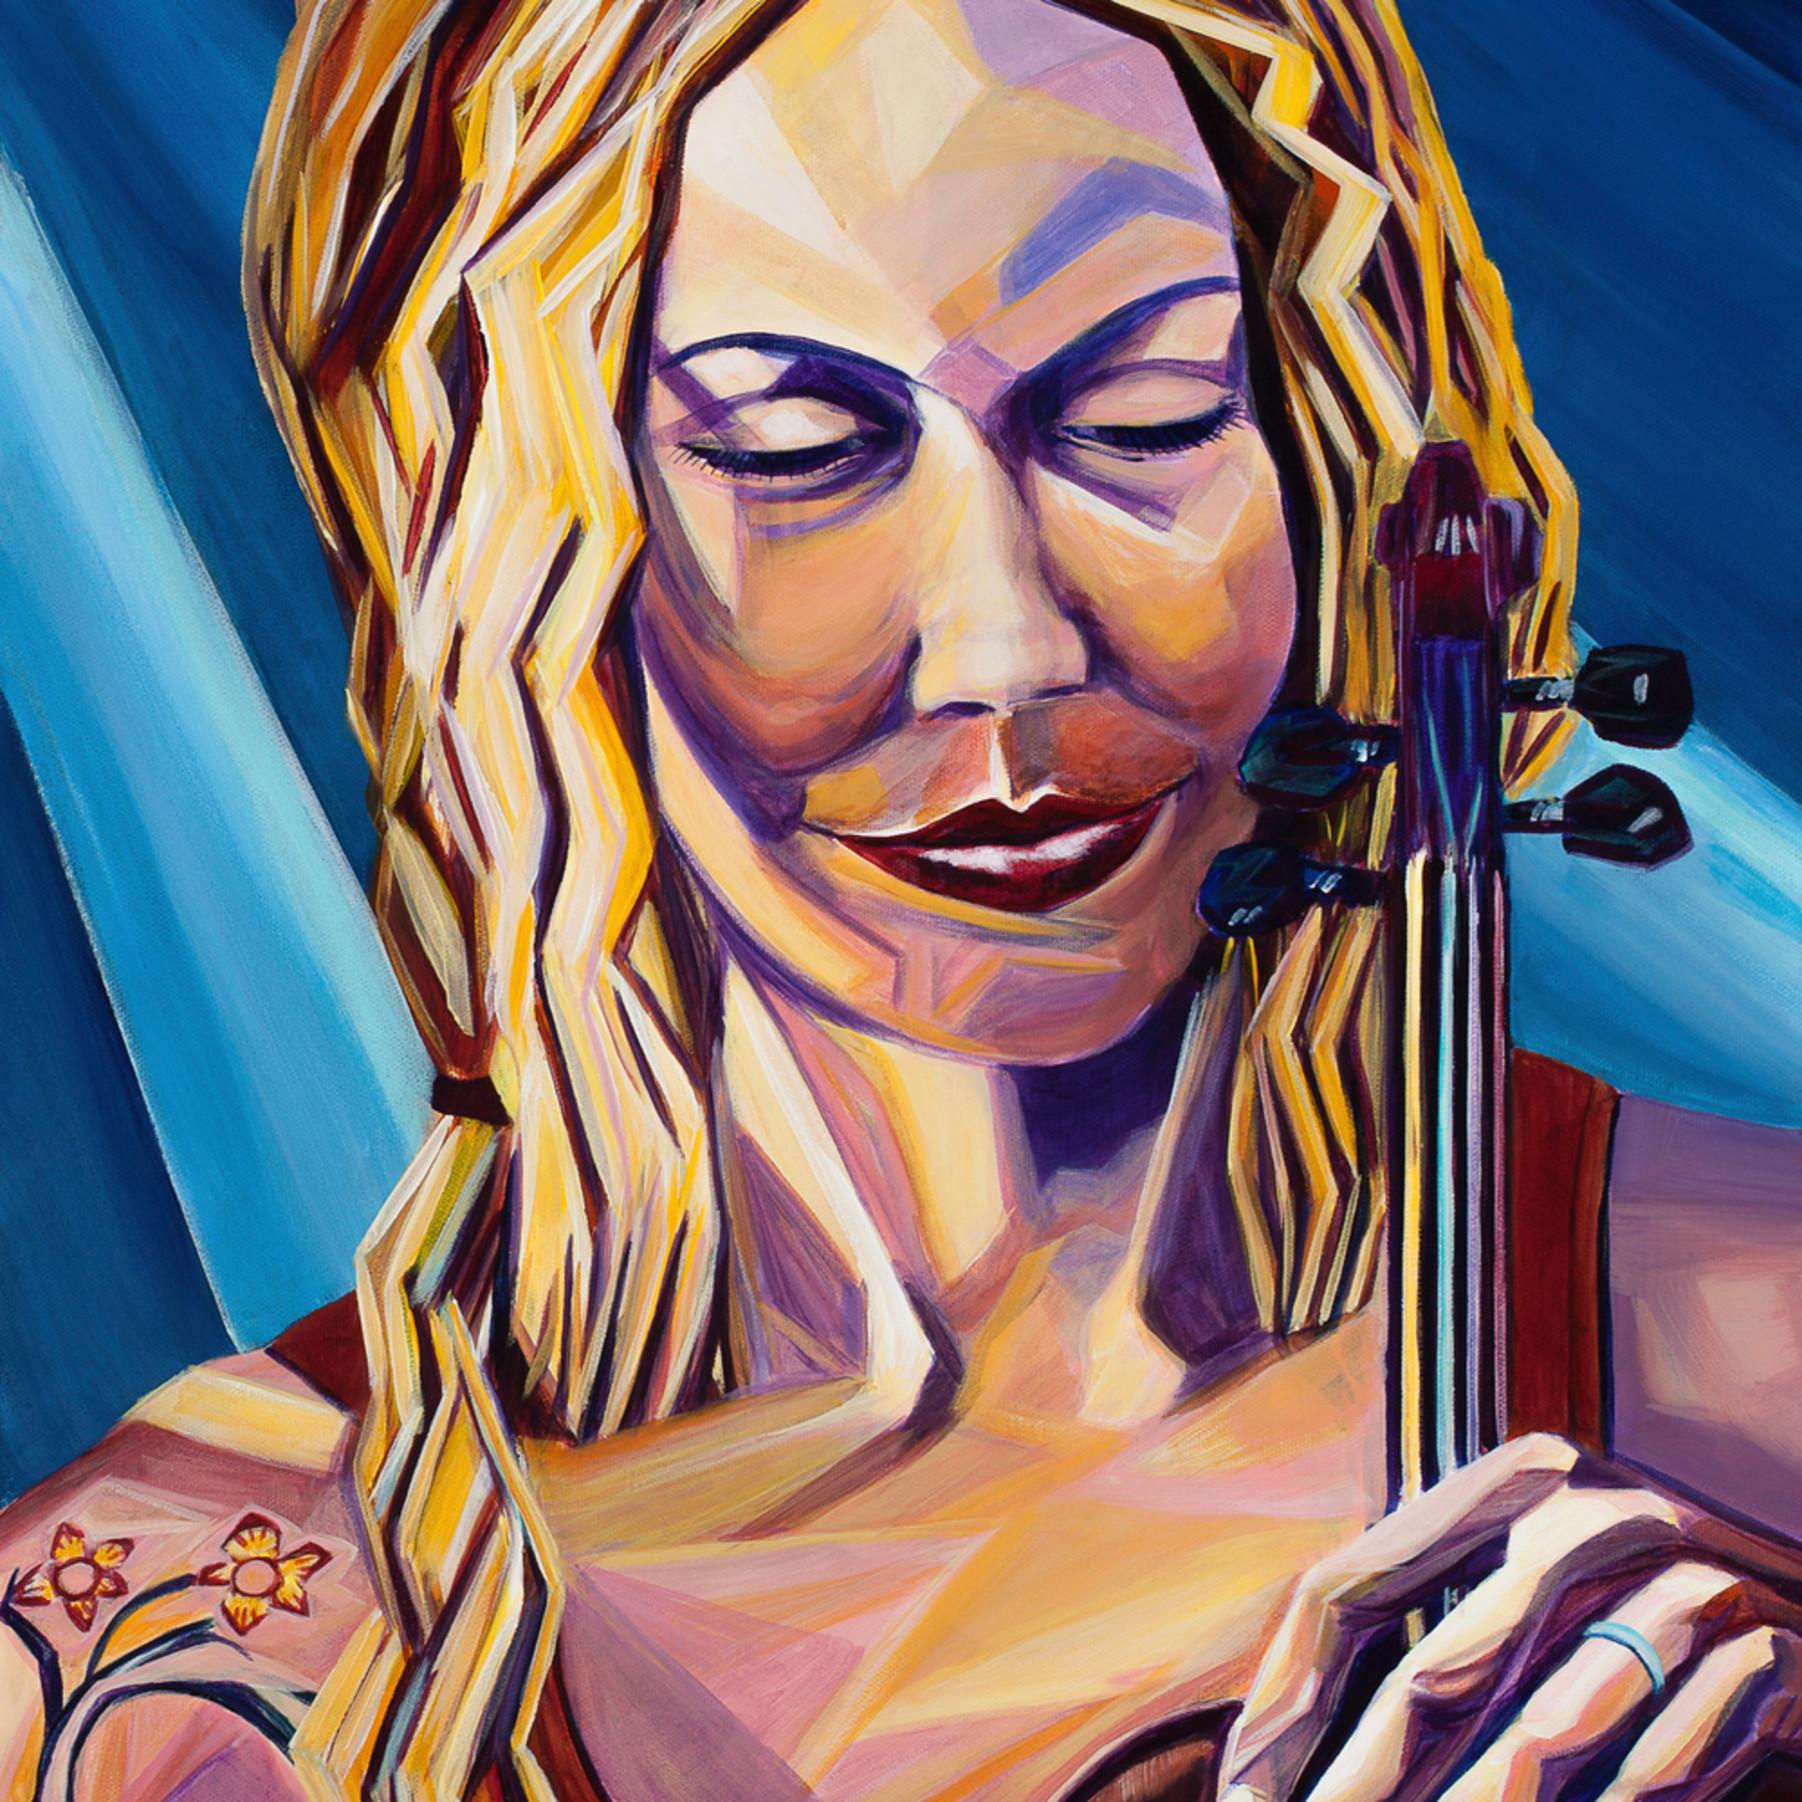 mg 2210 2592 x 3888 the violinist bv9rf2